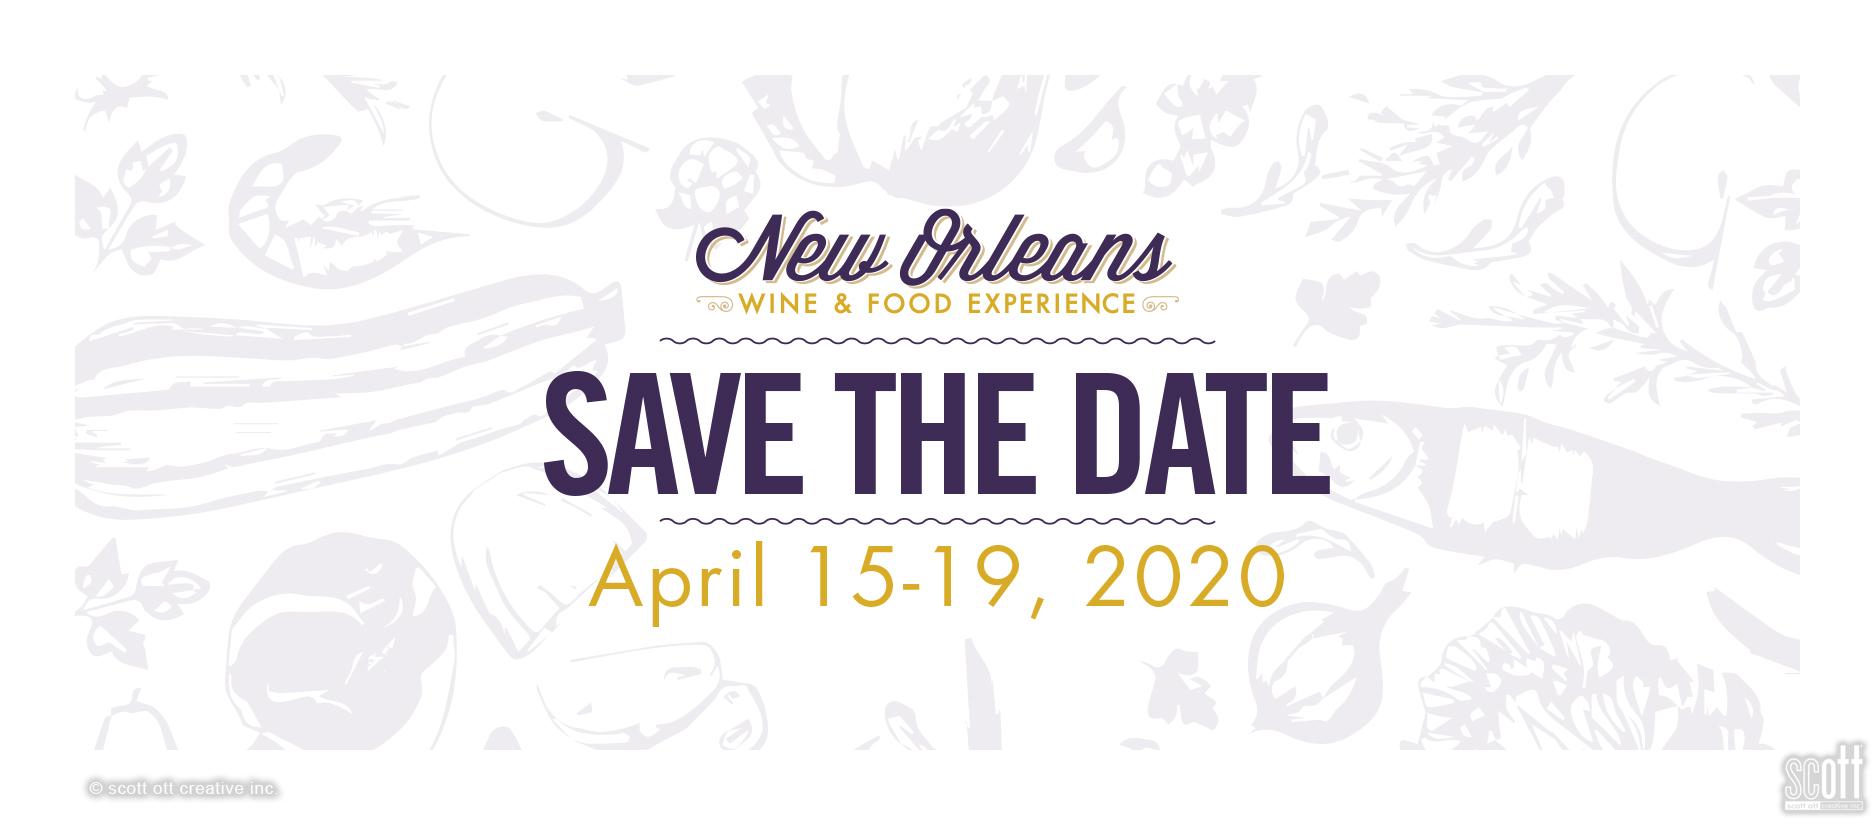 NOWFE 2020 SAVE THE DATE 2 - scott ott c